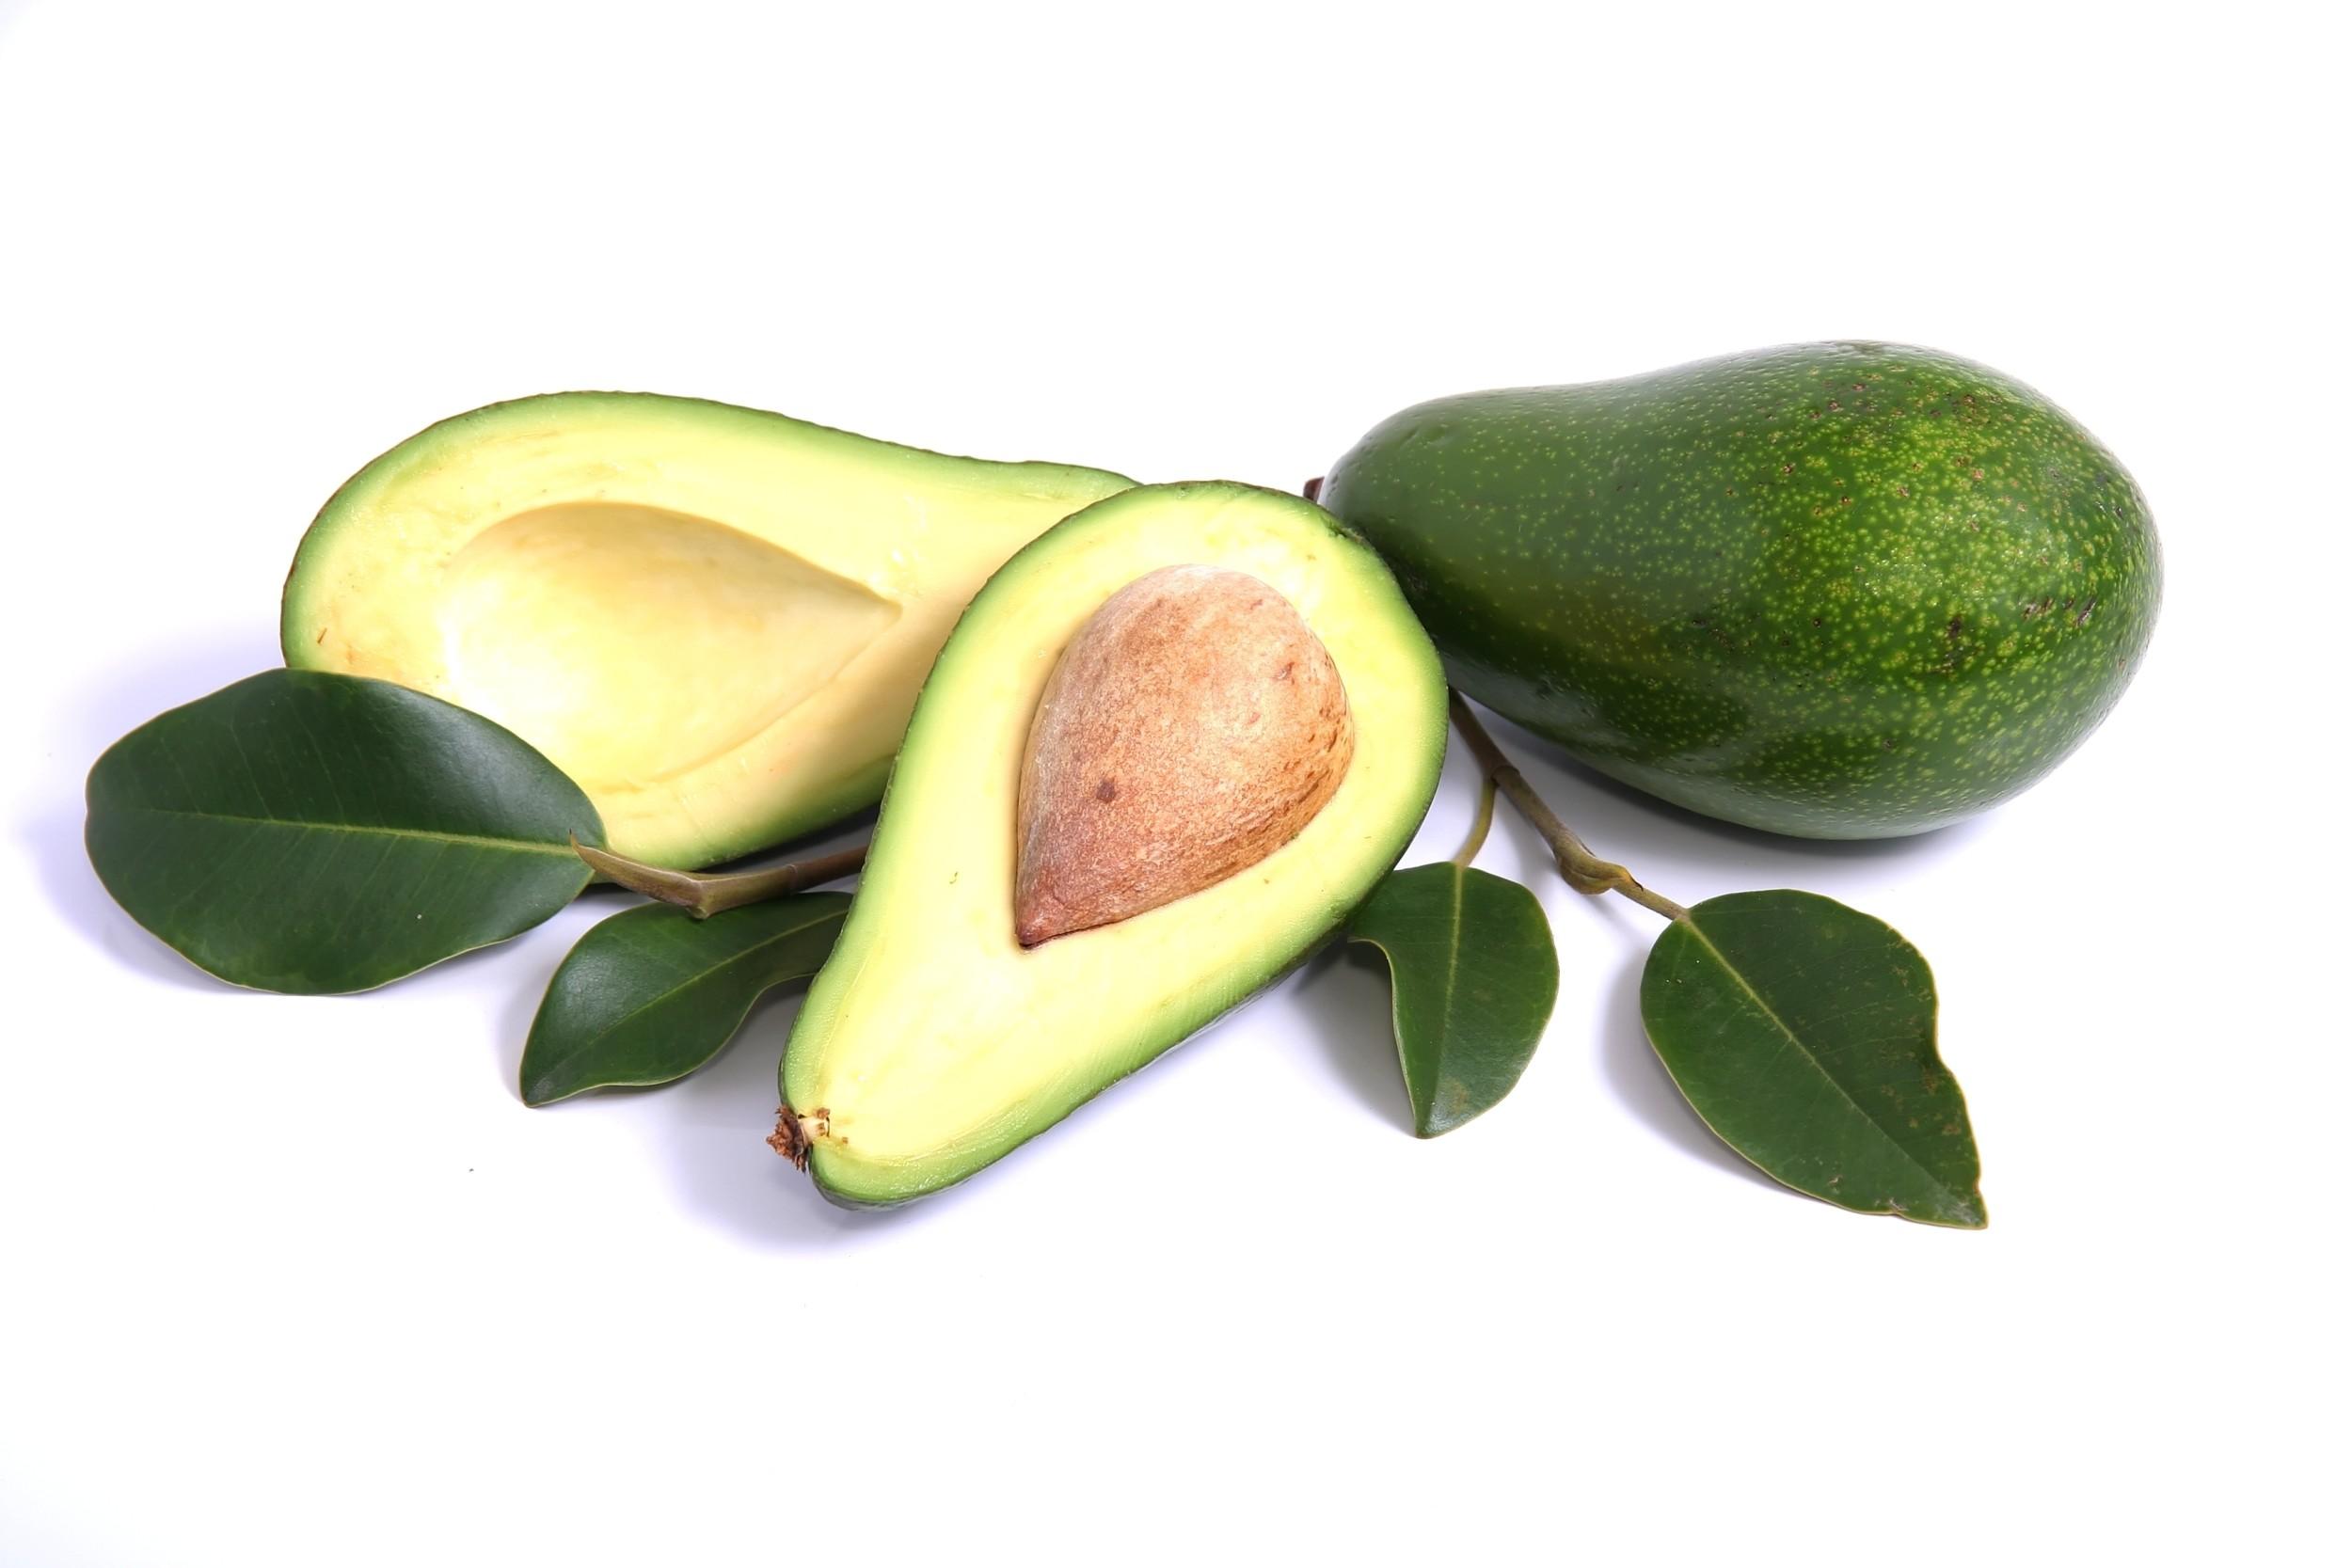 Abacate - Abacateiro - Fruta - InfoEscola